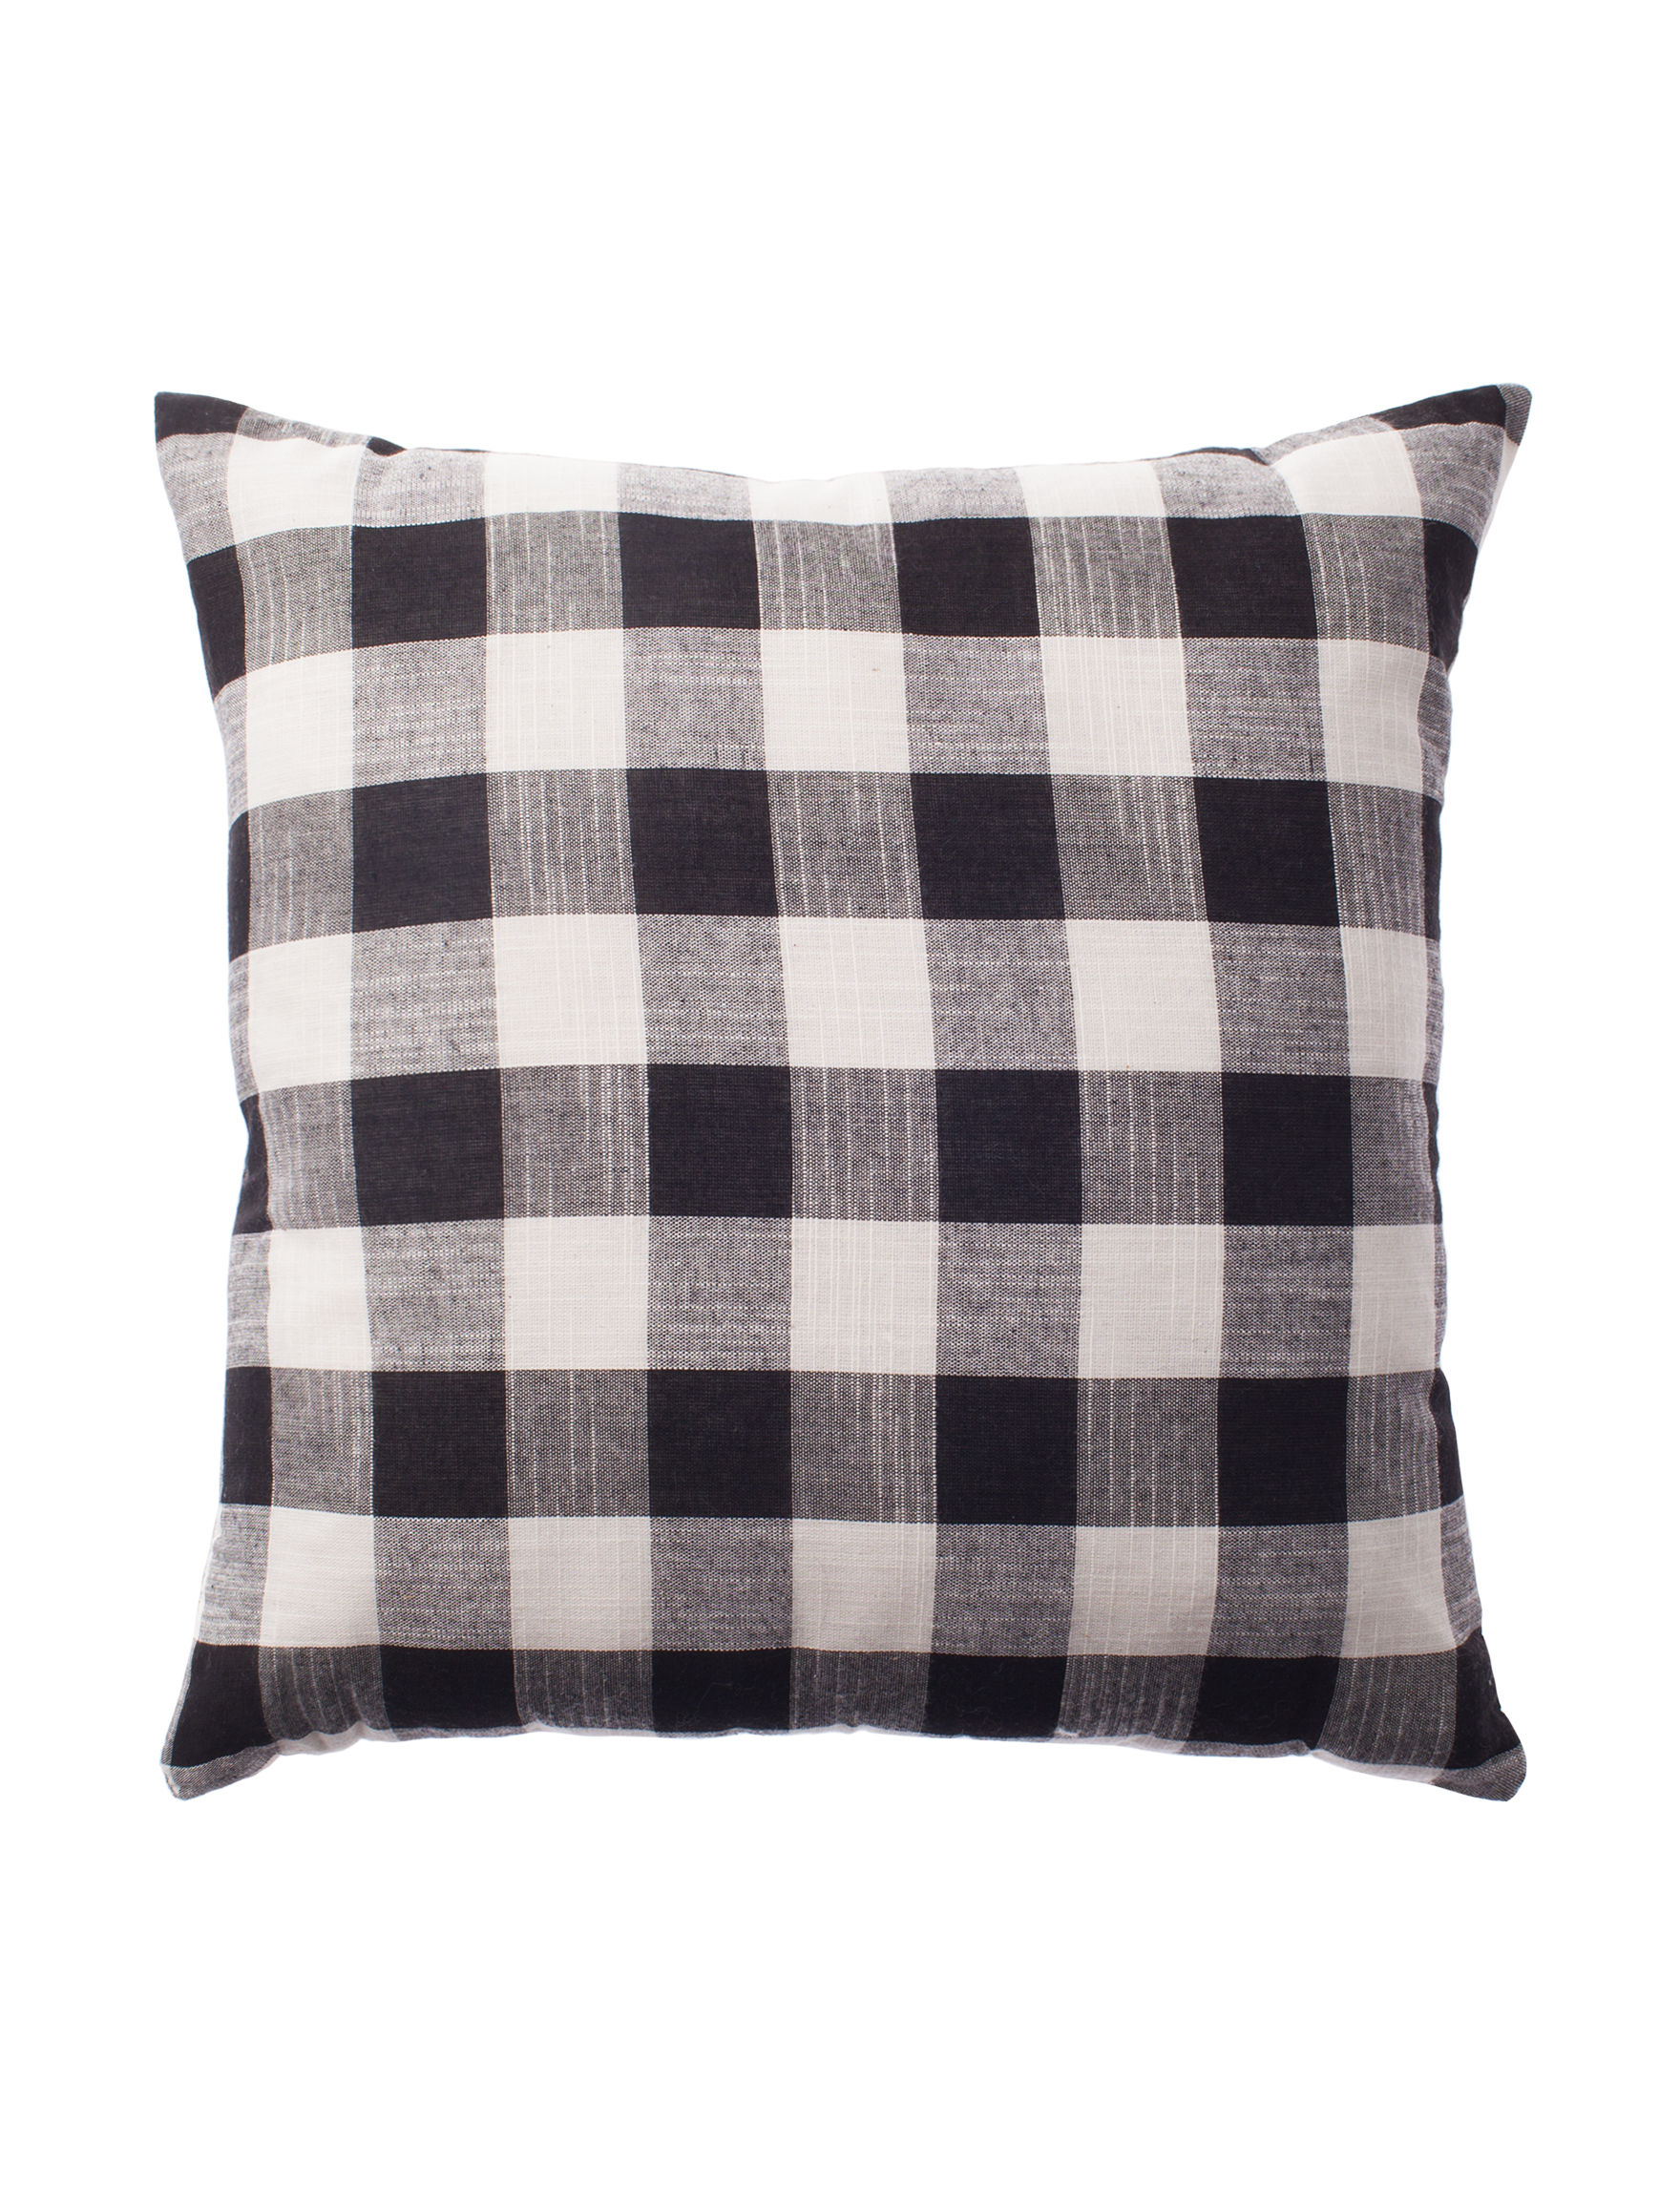 Deco Black / White Decorative Pillows